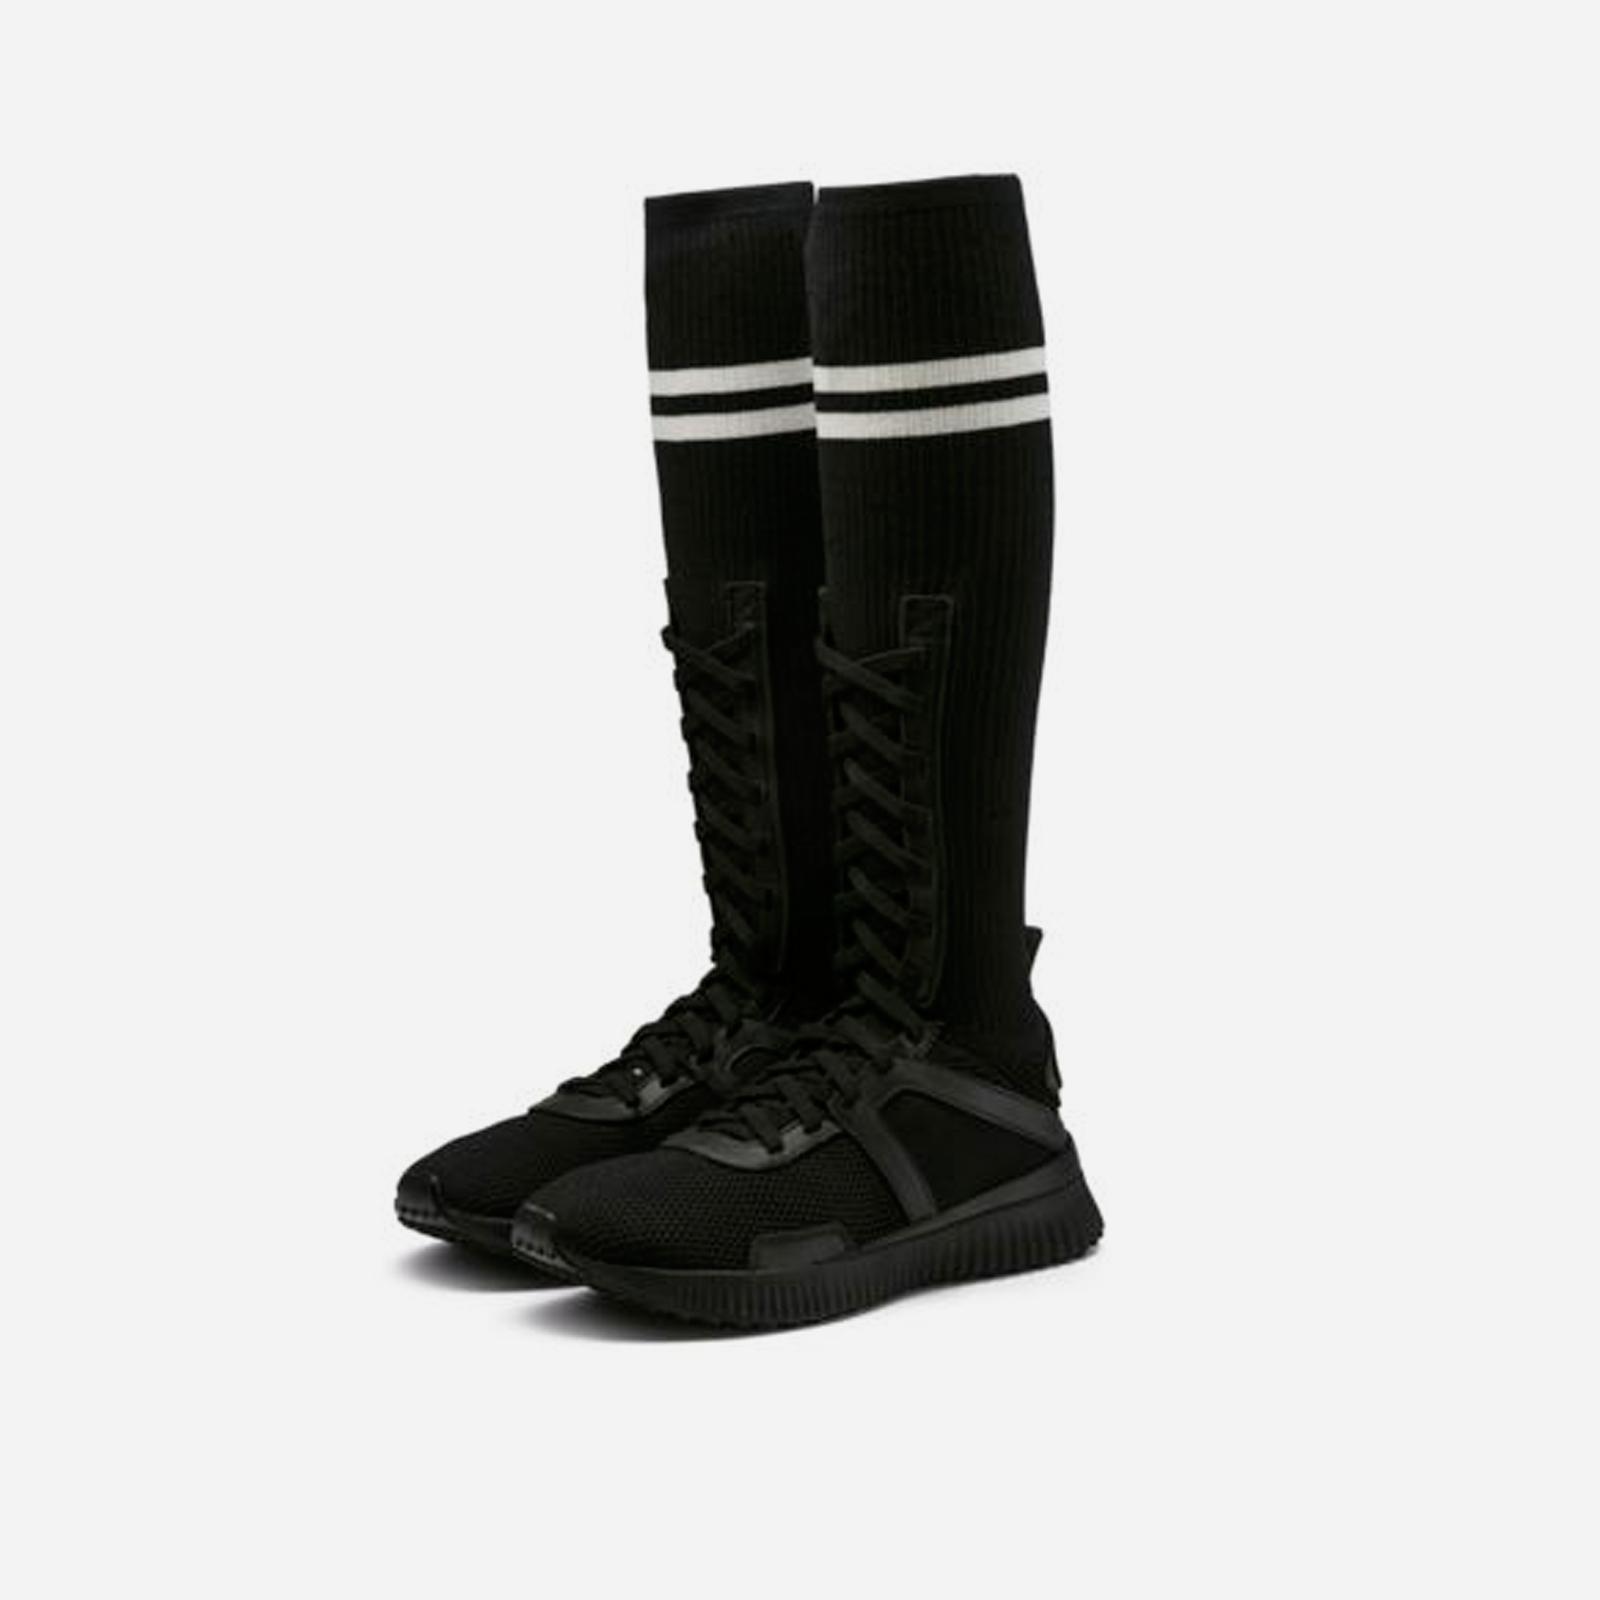 online store 7552f 2b4d6 Puma Fenty Trainer Hi - 191229-01 - Sneakersnstuff ...